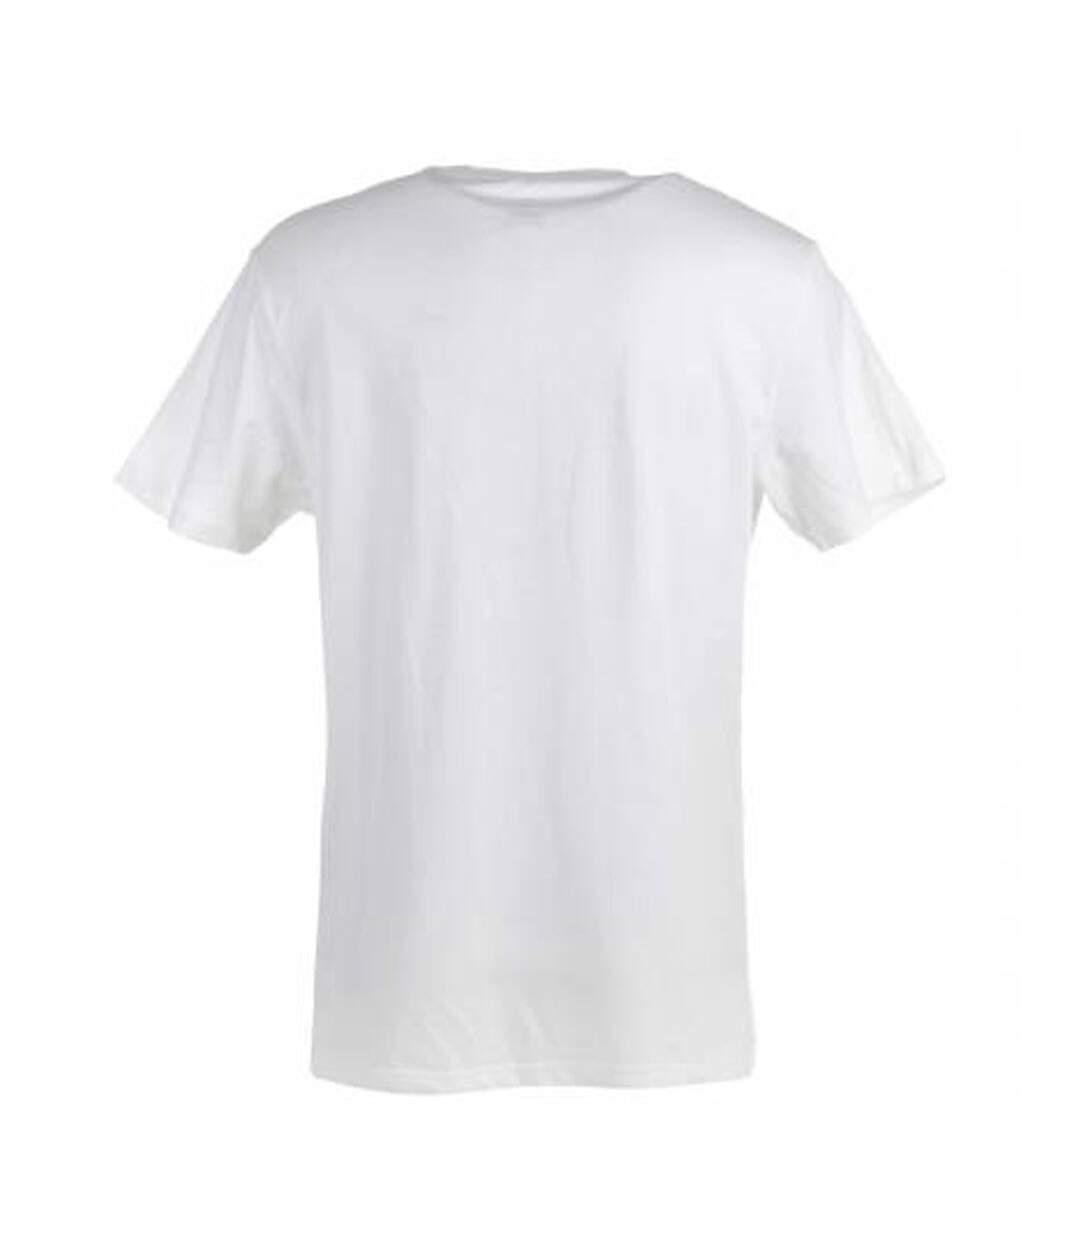 T-shirt Blanc Homme Billabong Stockpile